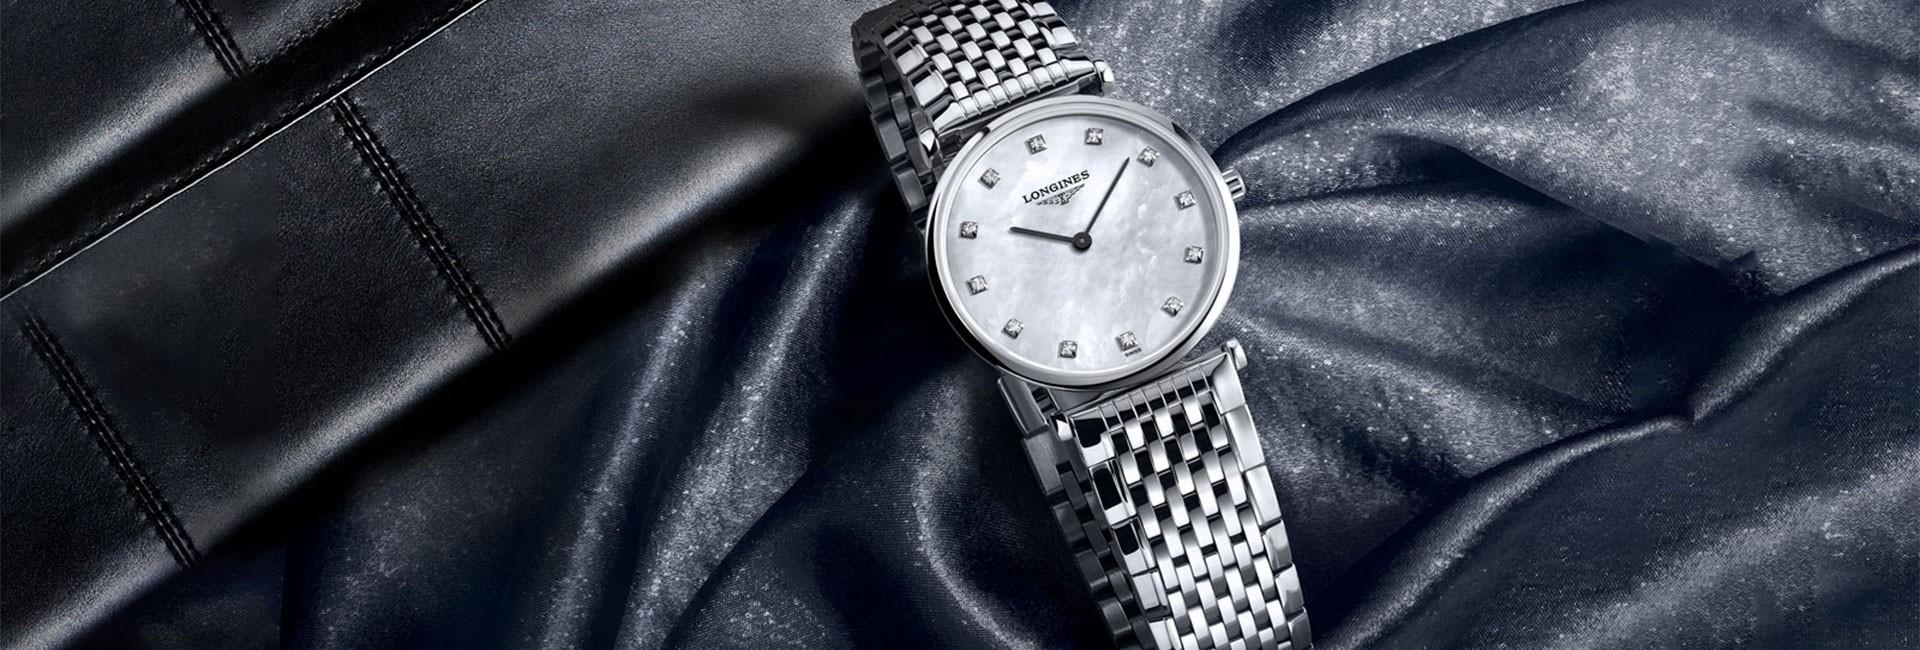 Diamonds set watch